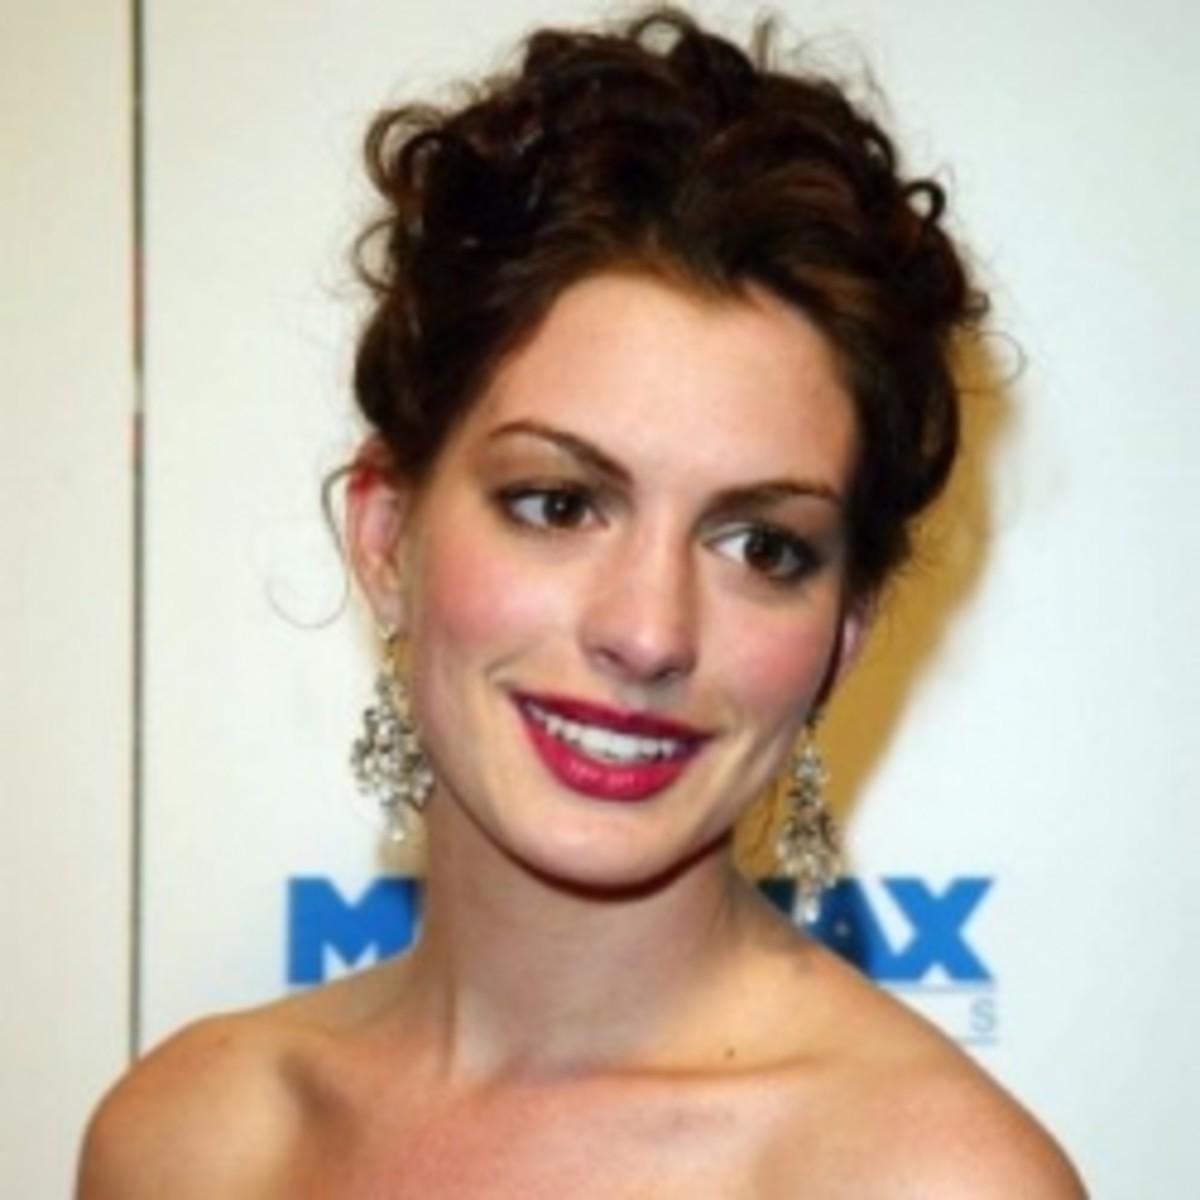 10 Best Anne Hathaway Films